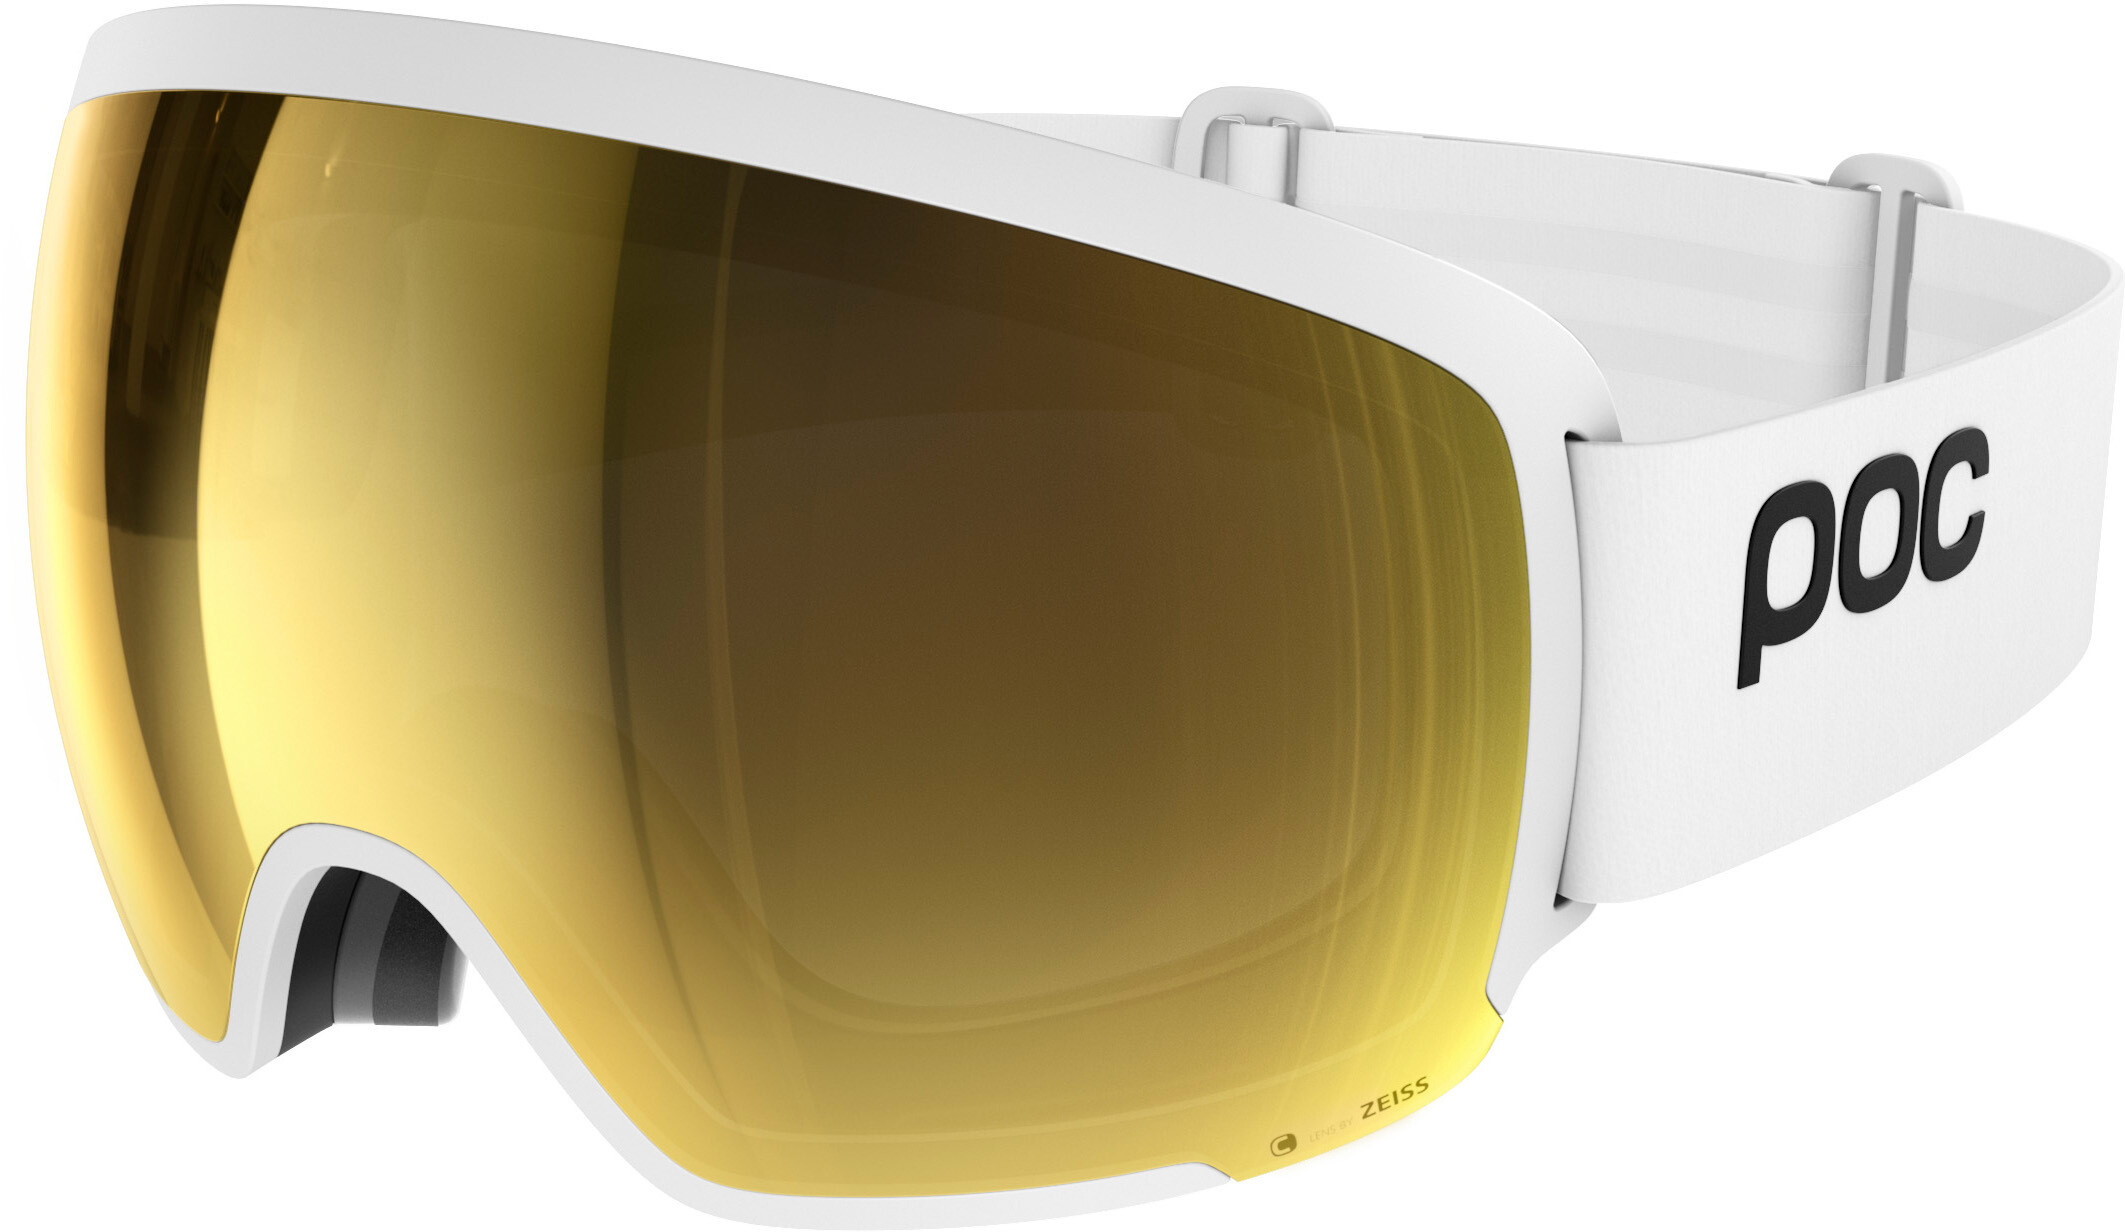 dcac73338b80 POC Orb Clarity Goggles hvid guld